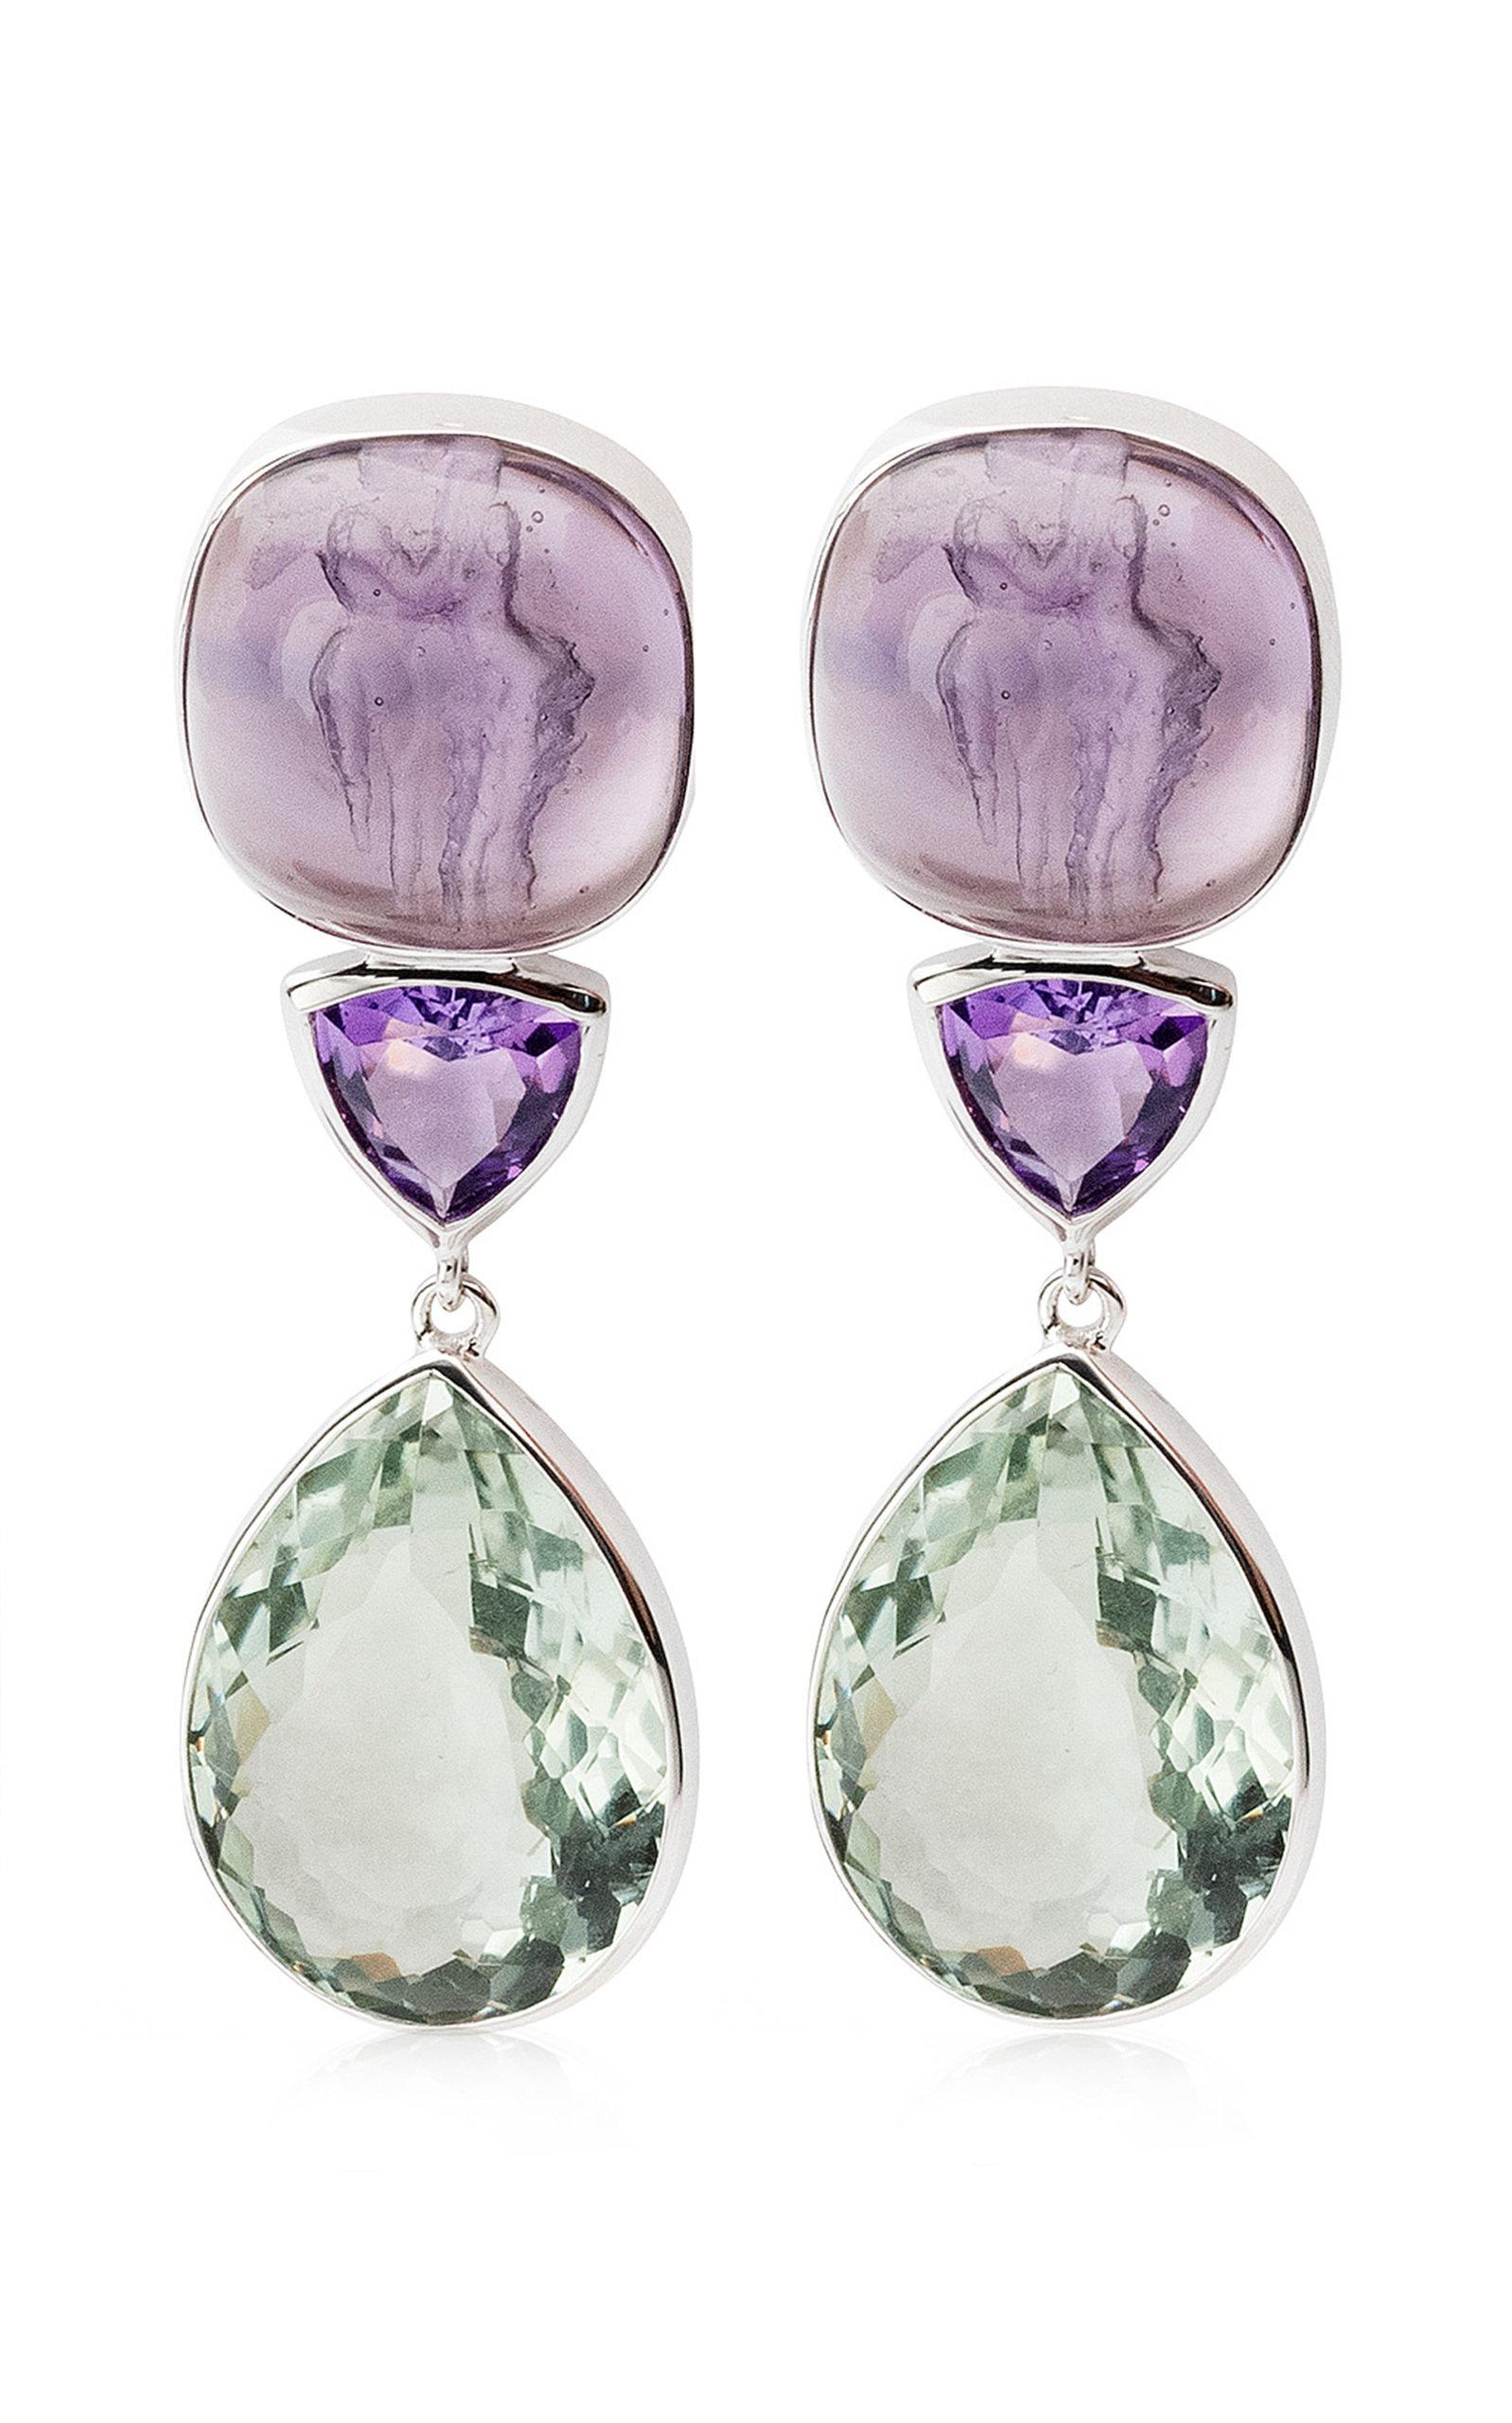 Women's Amethyst; Venetian Glass Cameo 18K White Gold Earrings